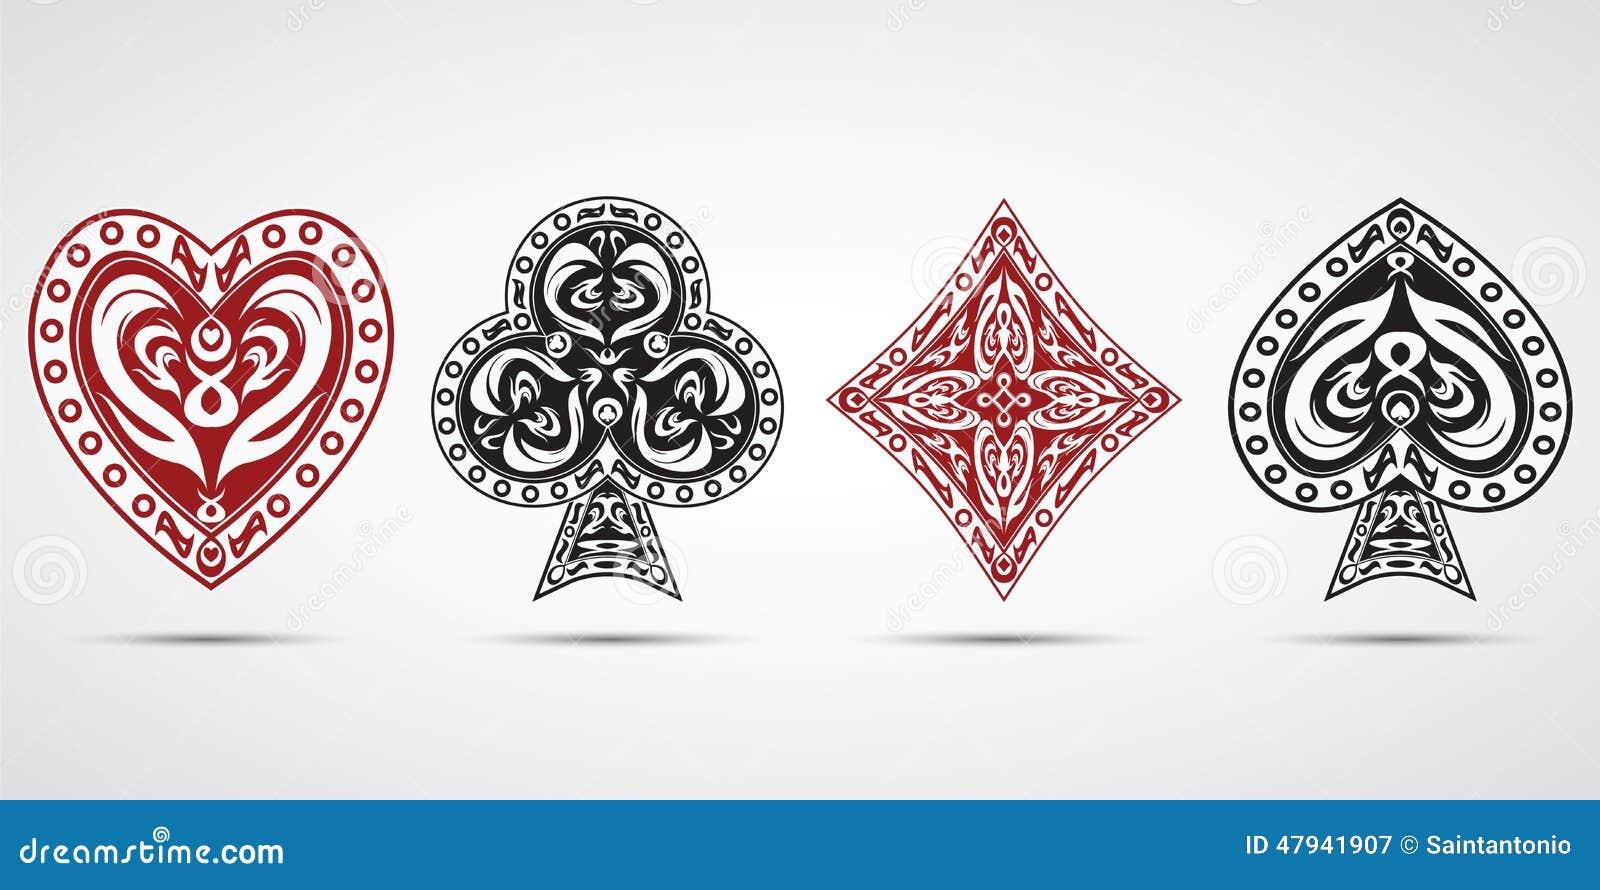 Spades hearts diamonds clubs poker cards symbols grey background spades hearts diamonds clubs poker cards symbols grey background biocorpaavc Choice Image